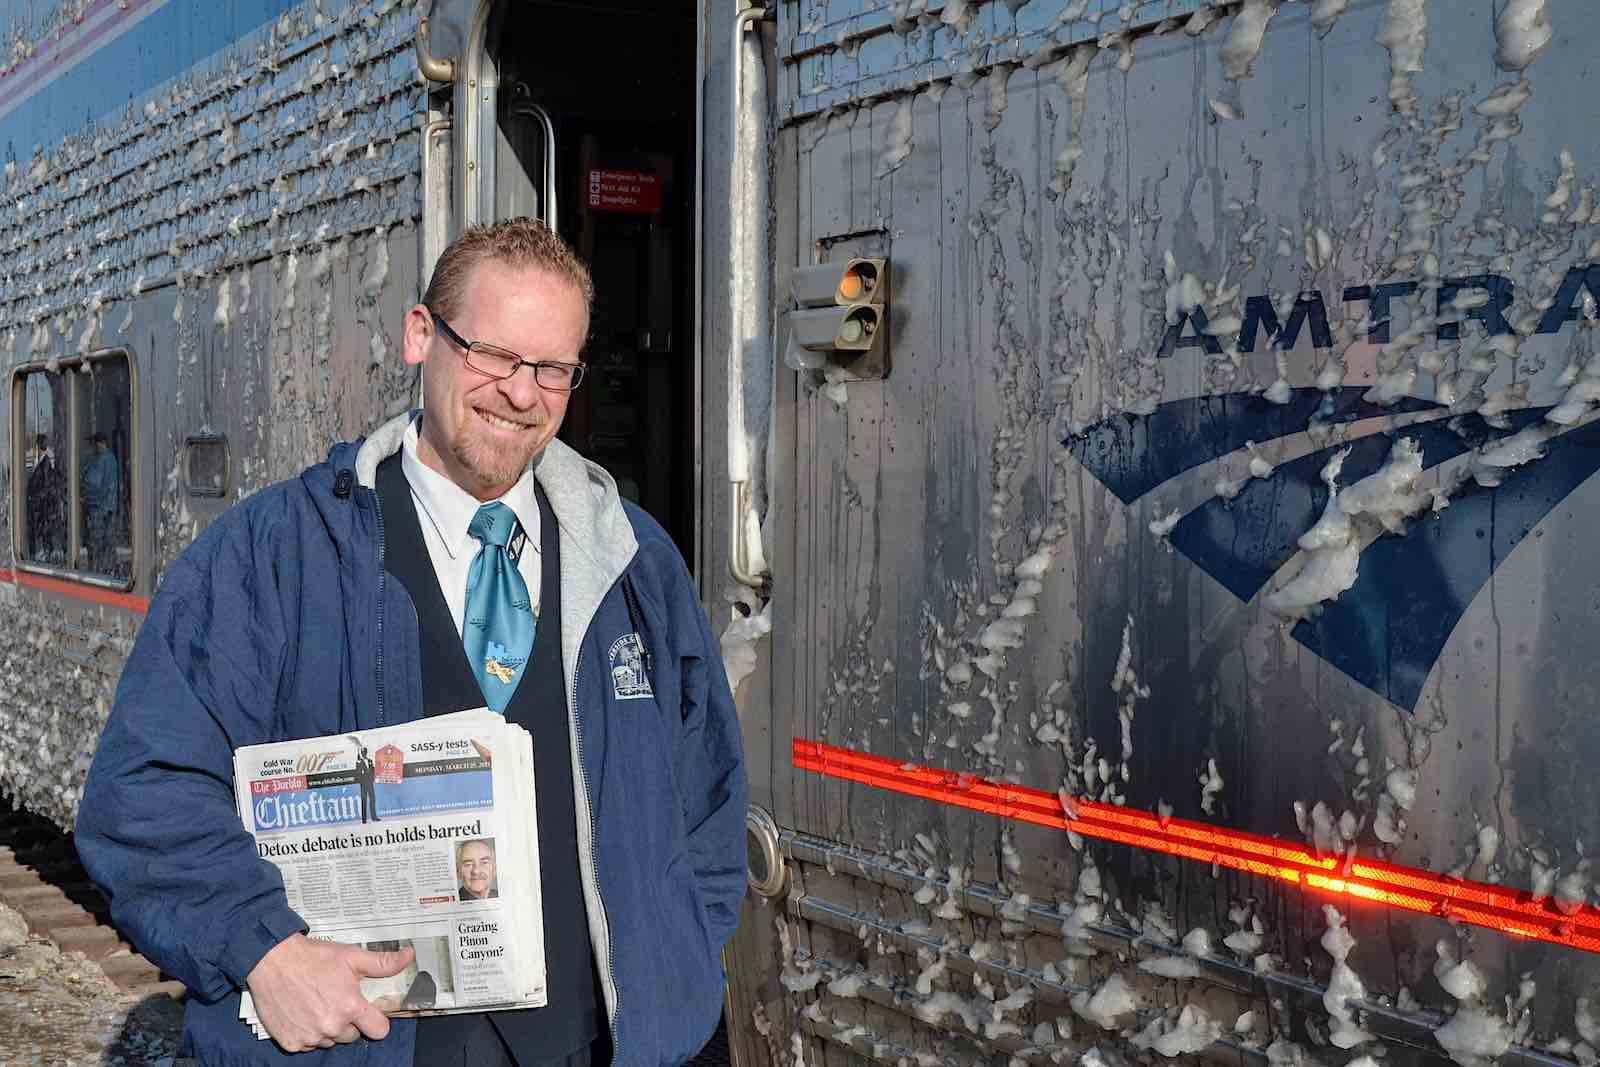 amtrak attendant holding morning newspapers